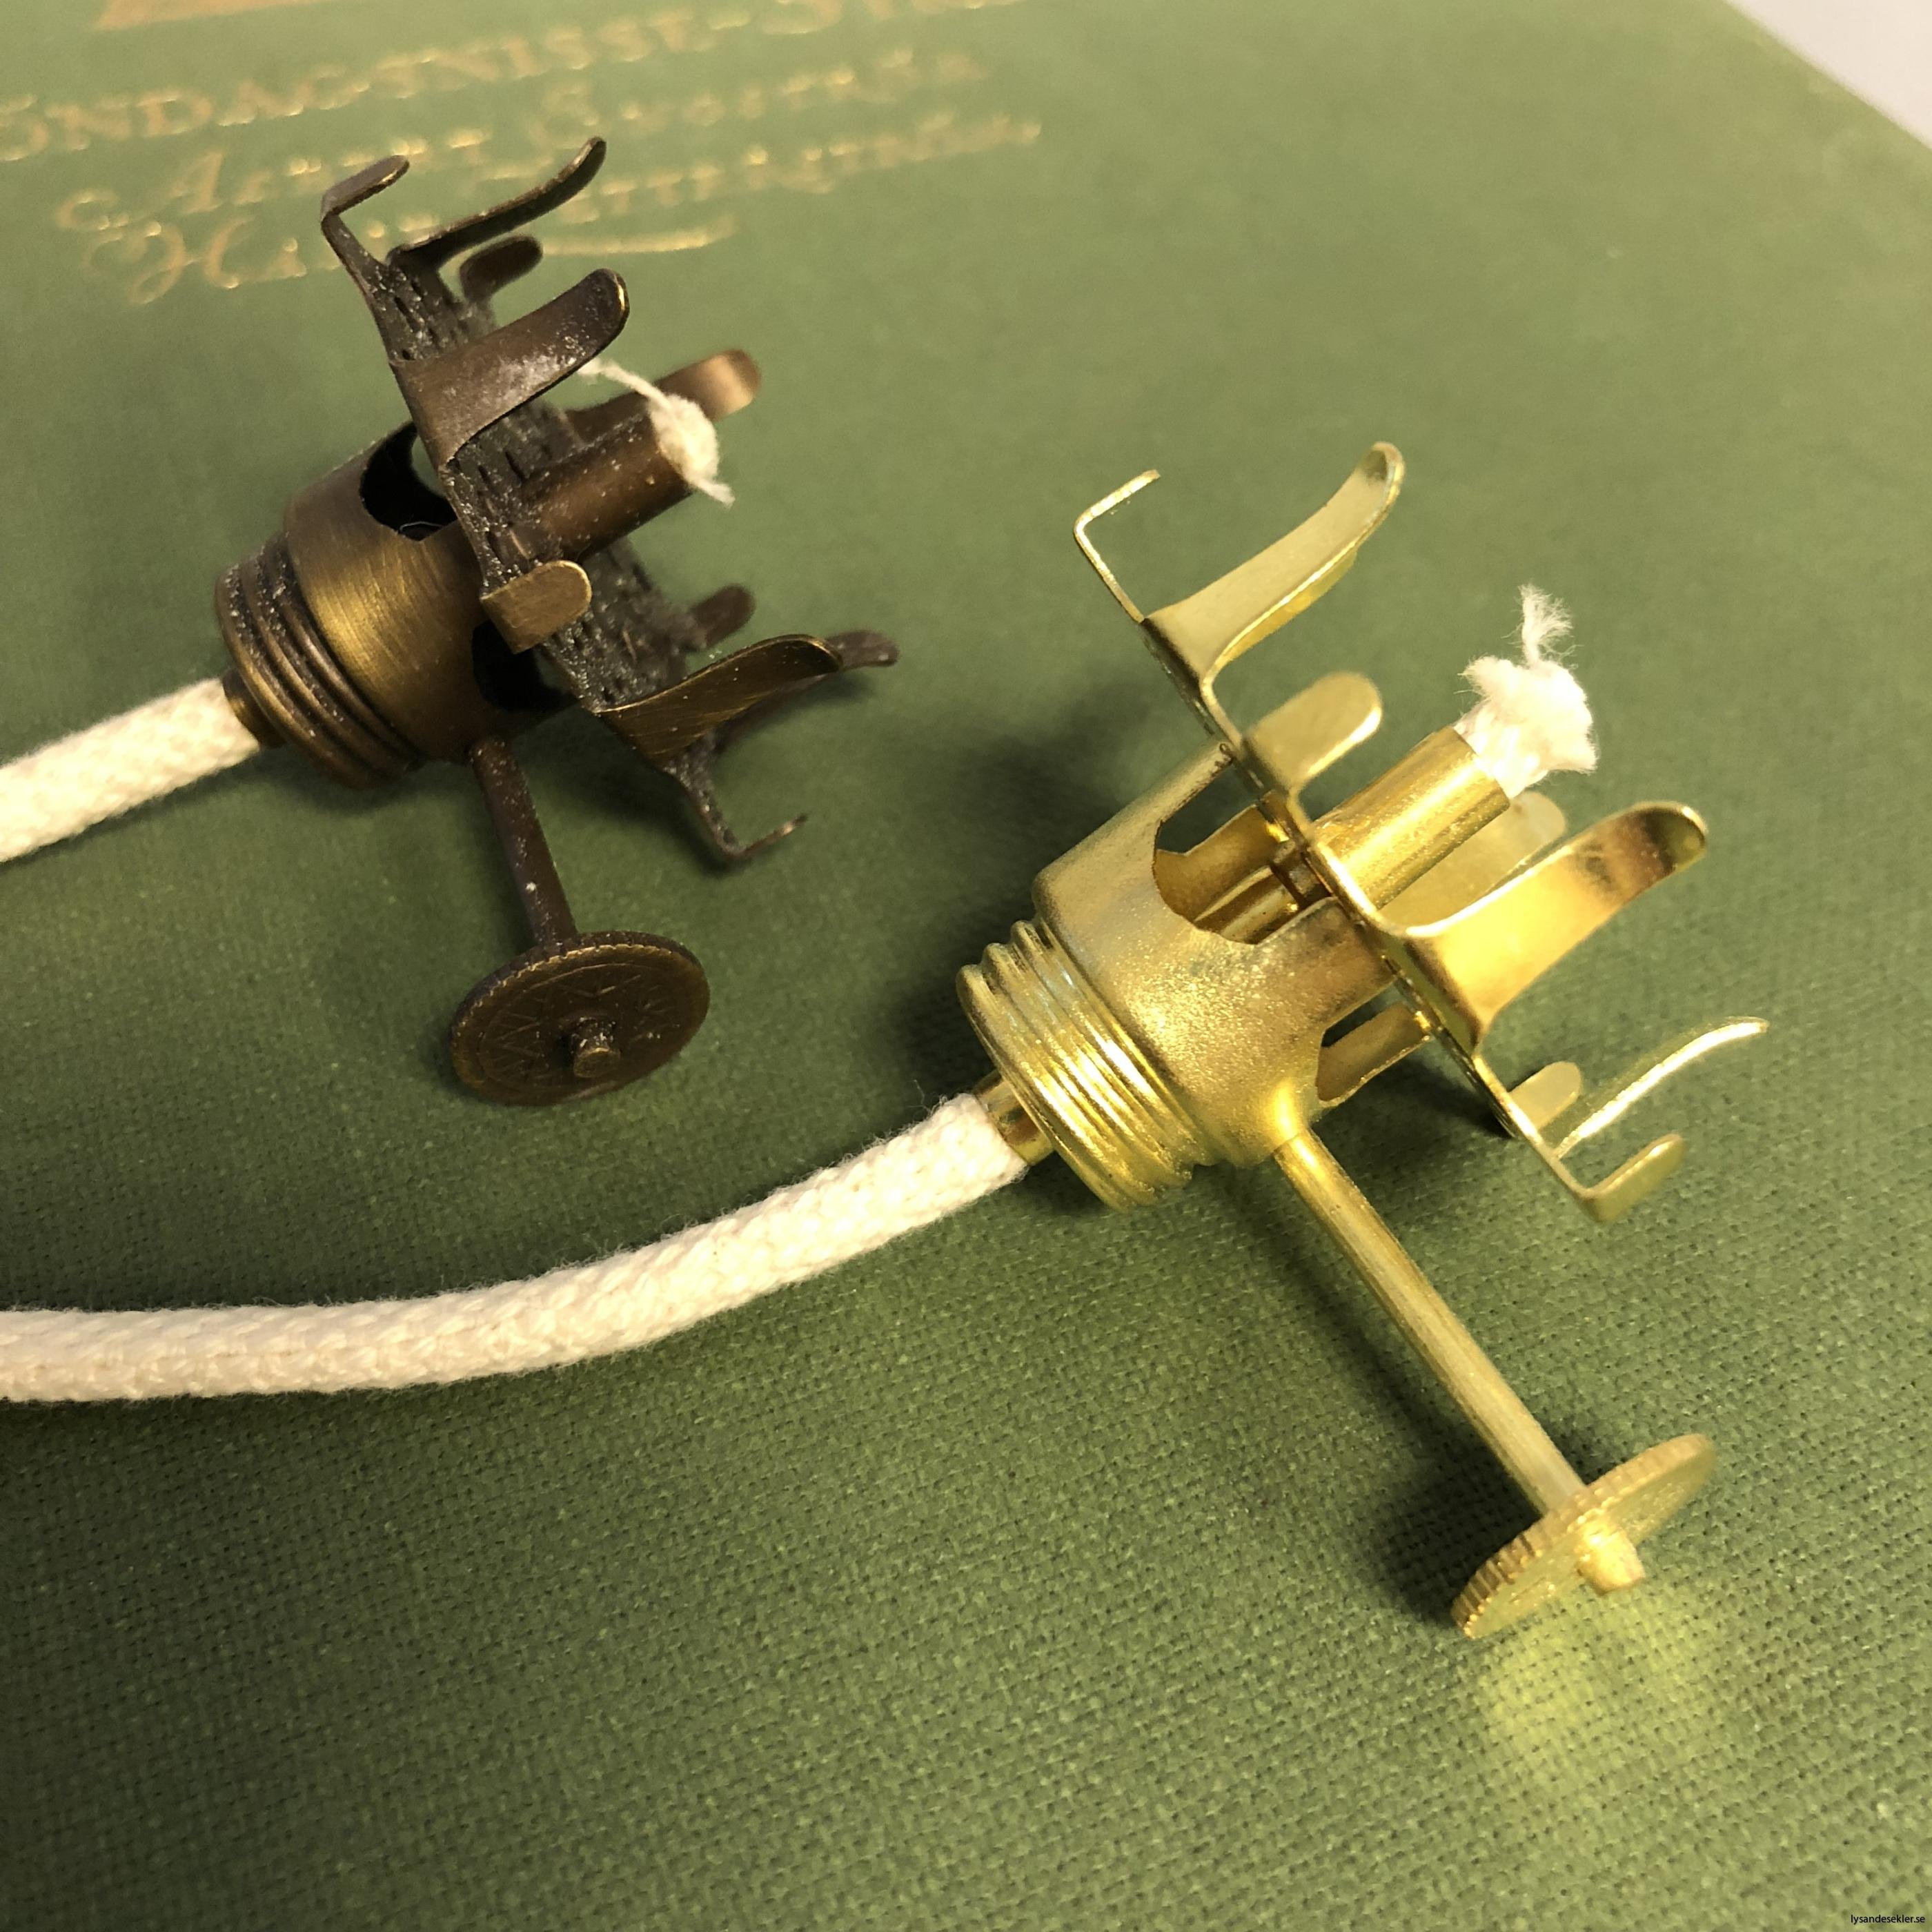 2 linjers brännare fotogenlampa3